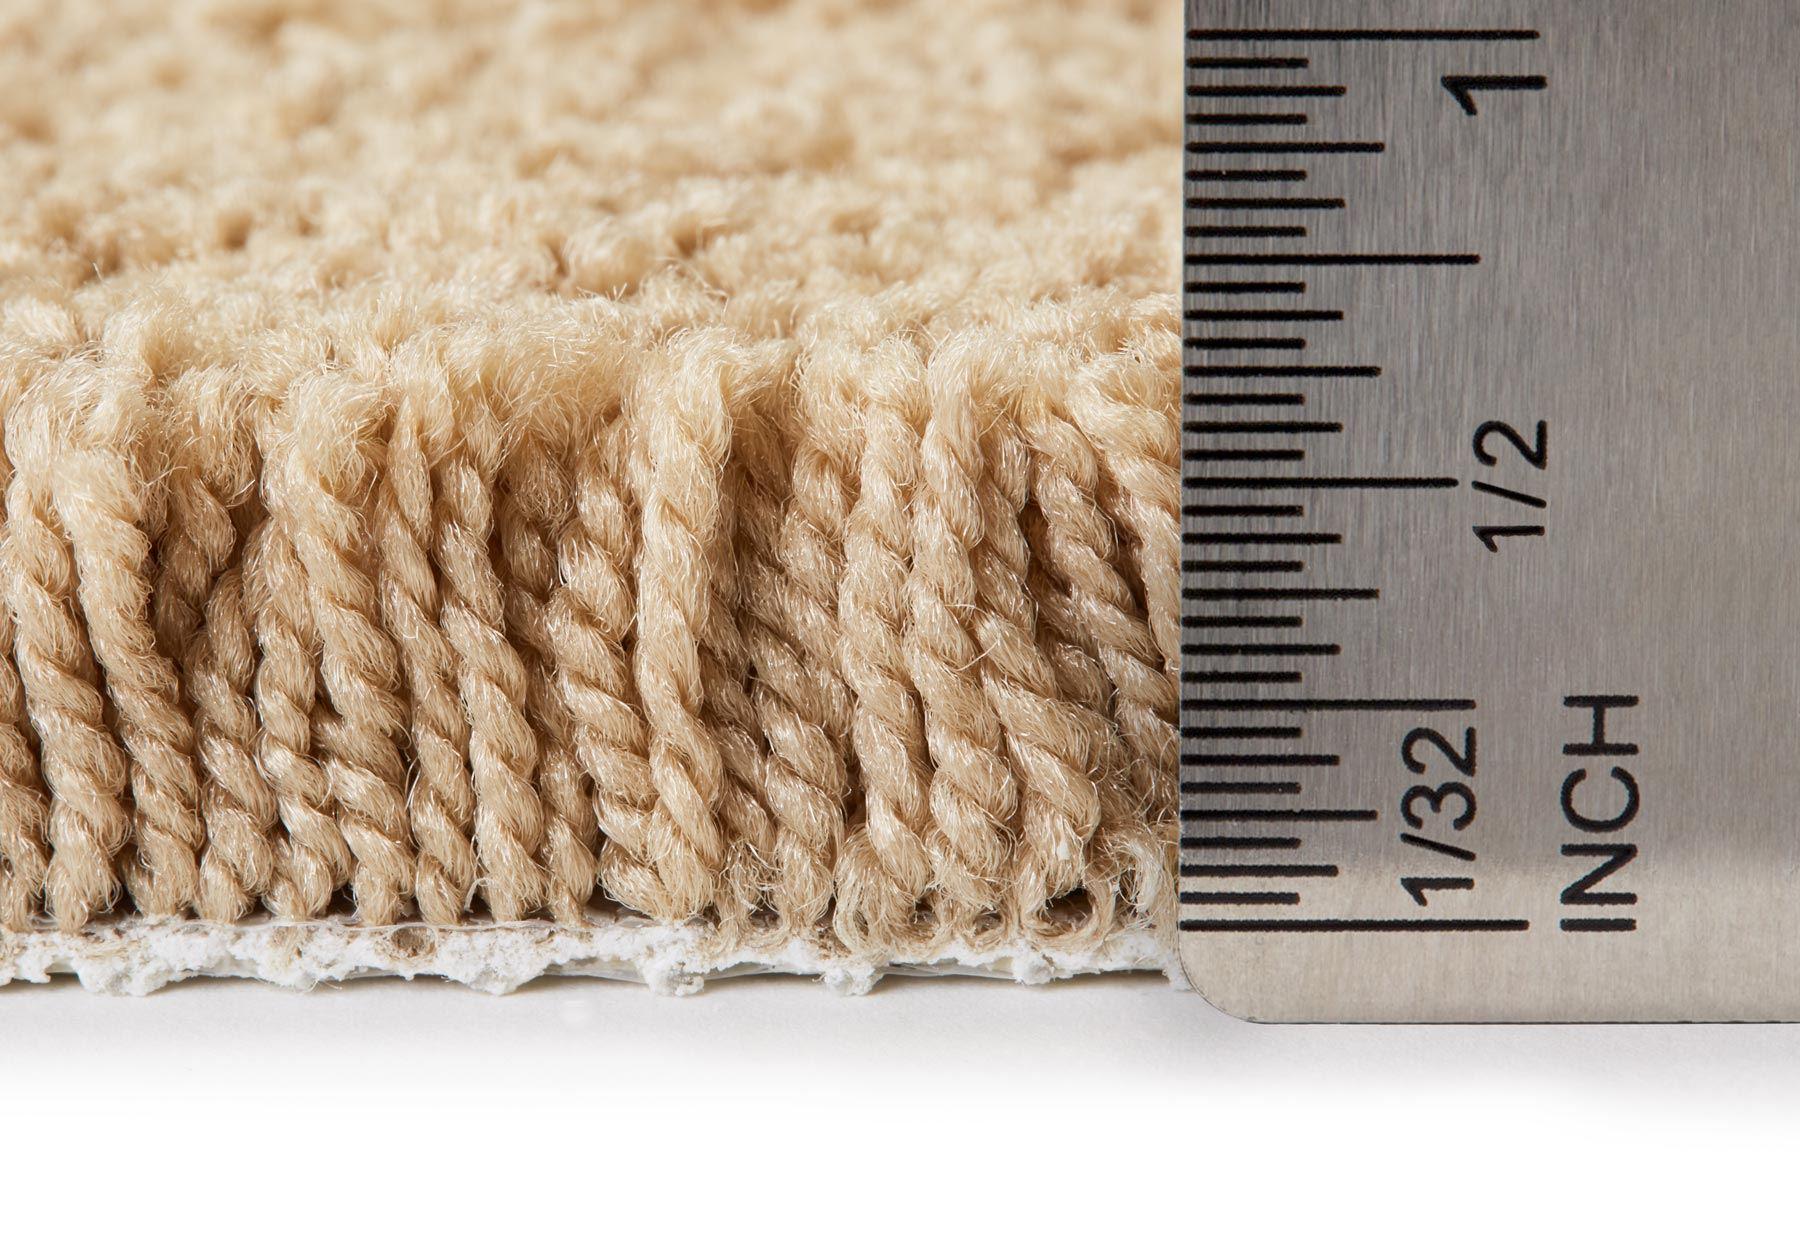 Cloud Nine Sepia Filter Carpet